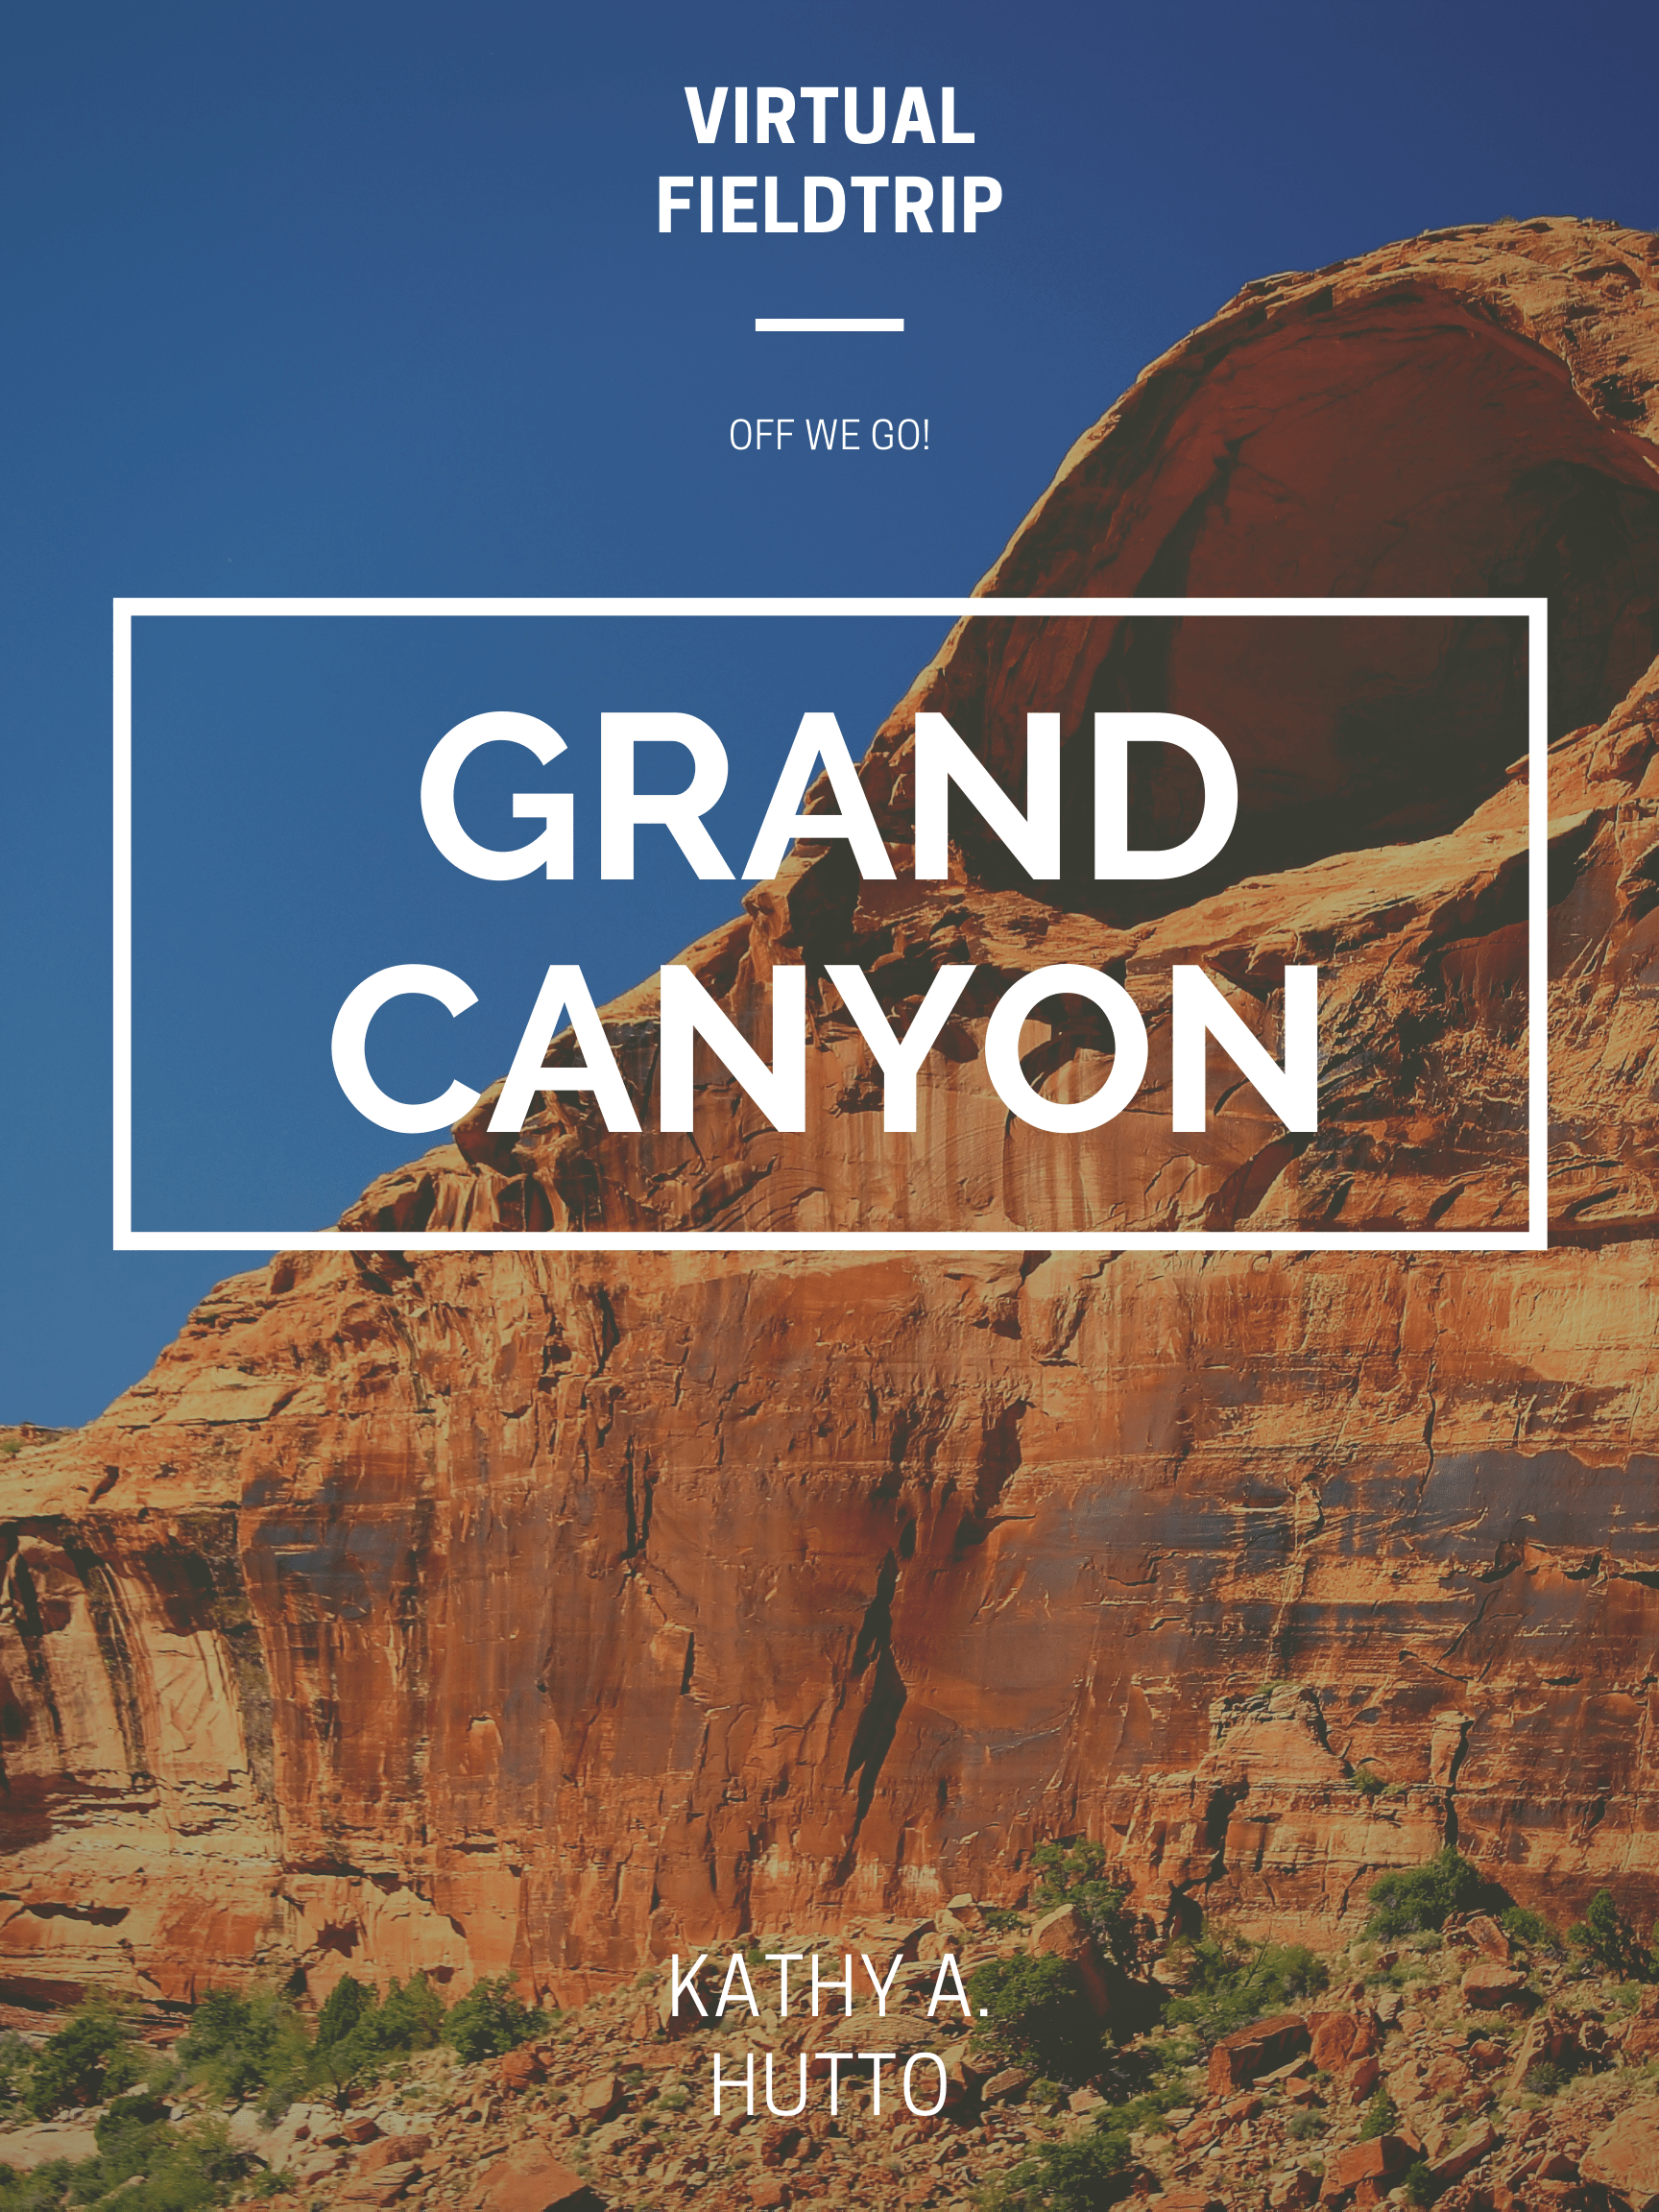 Virtual Fieldtrip Grand Canyon In